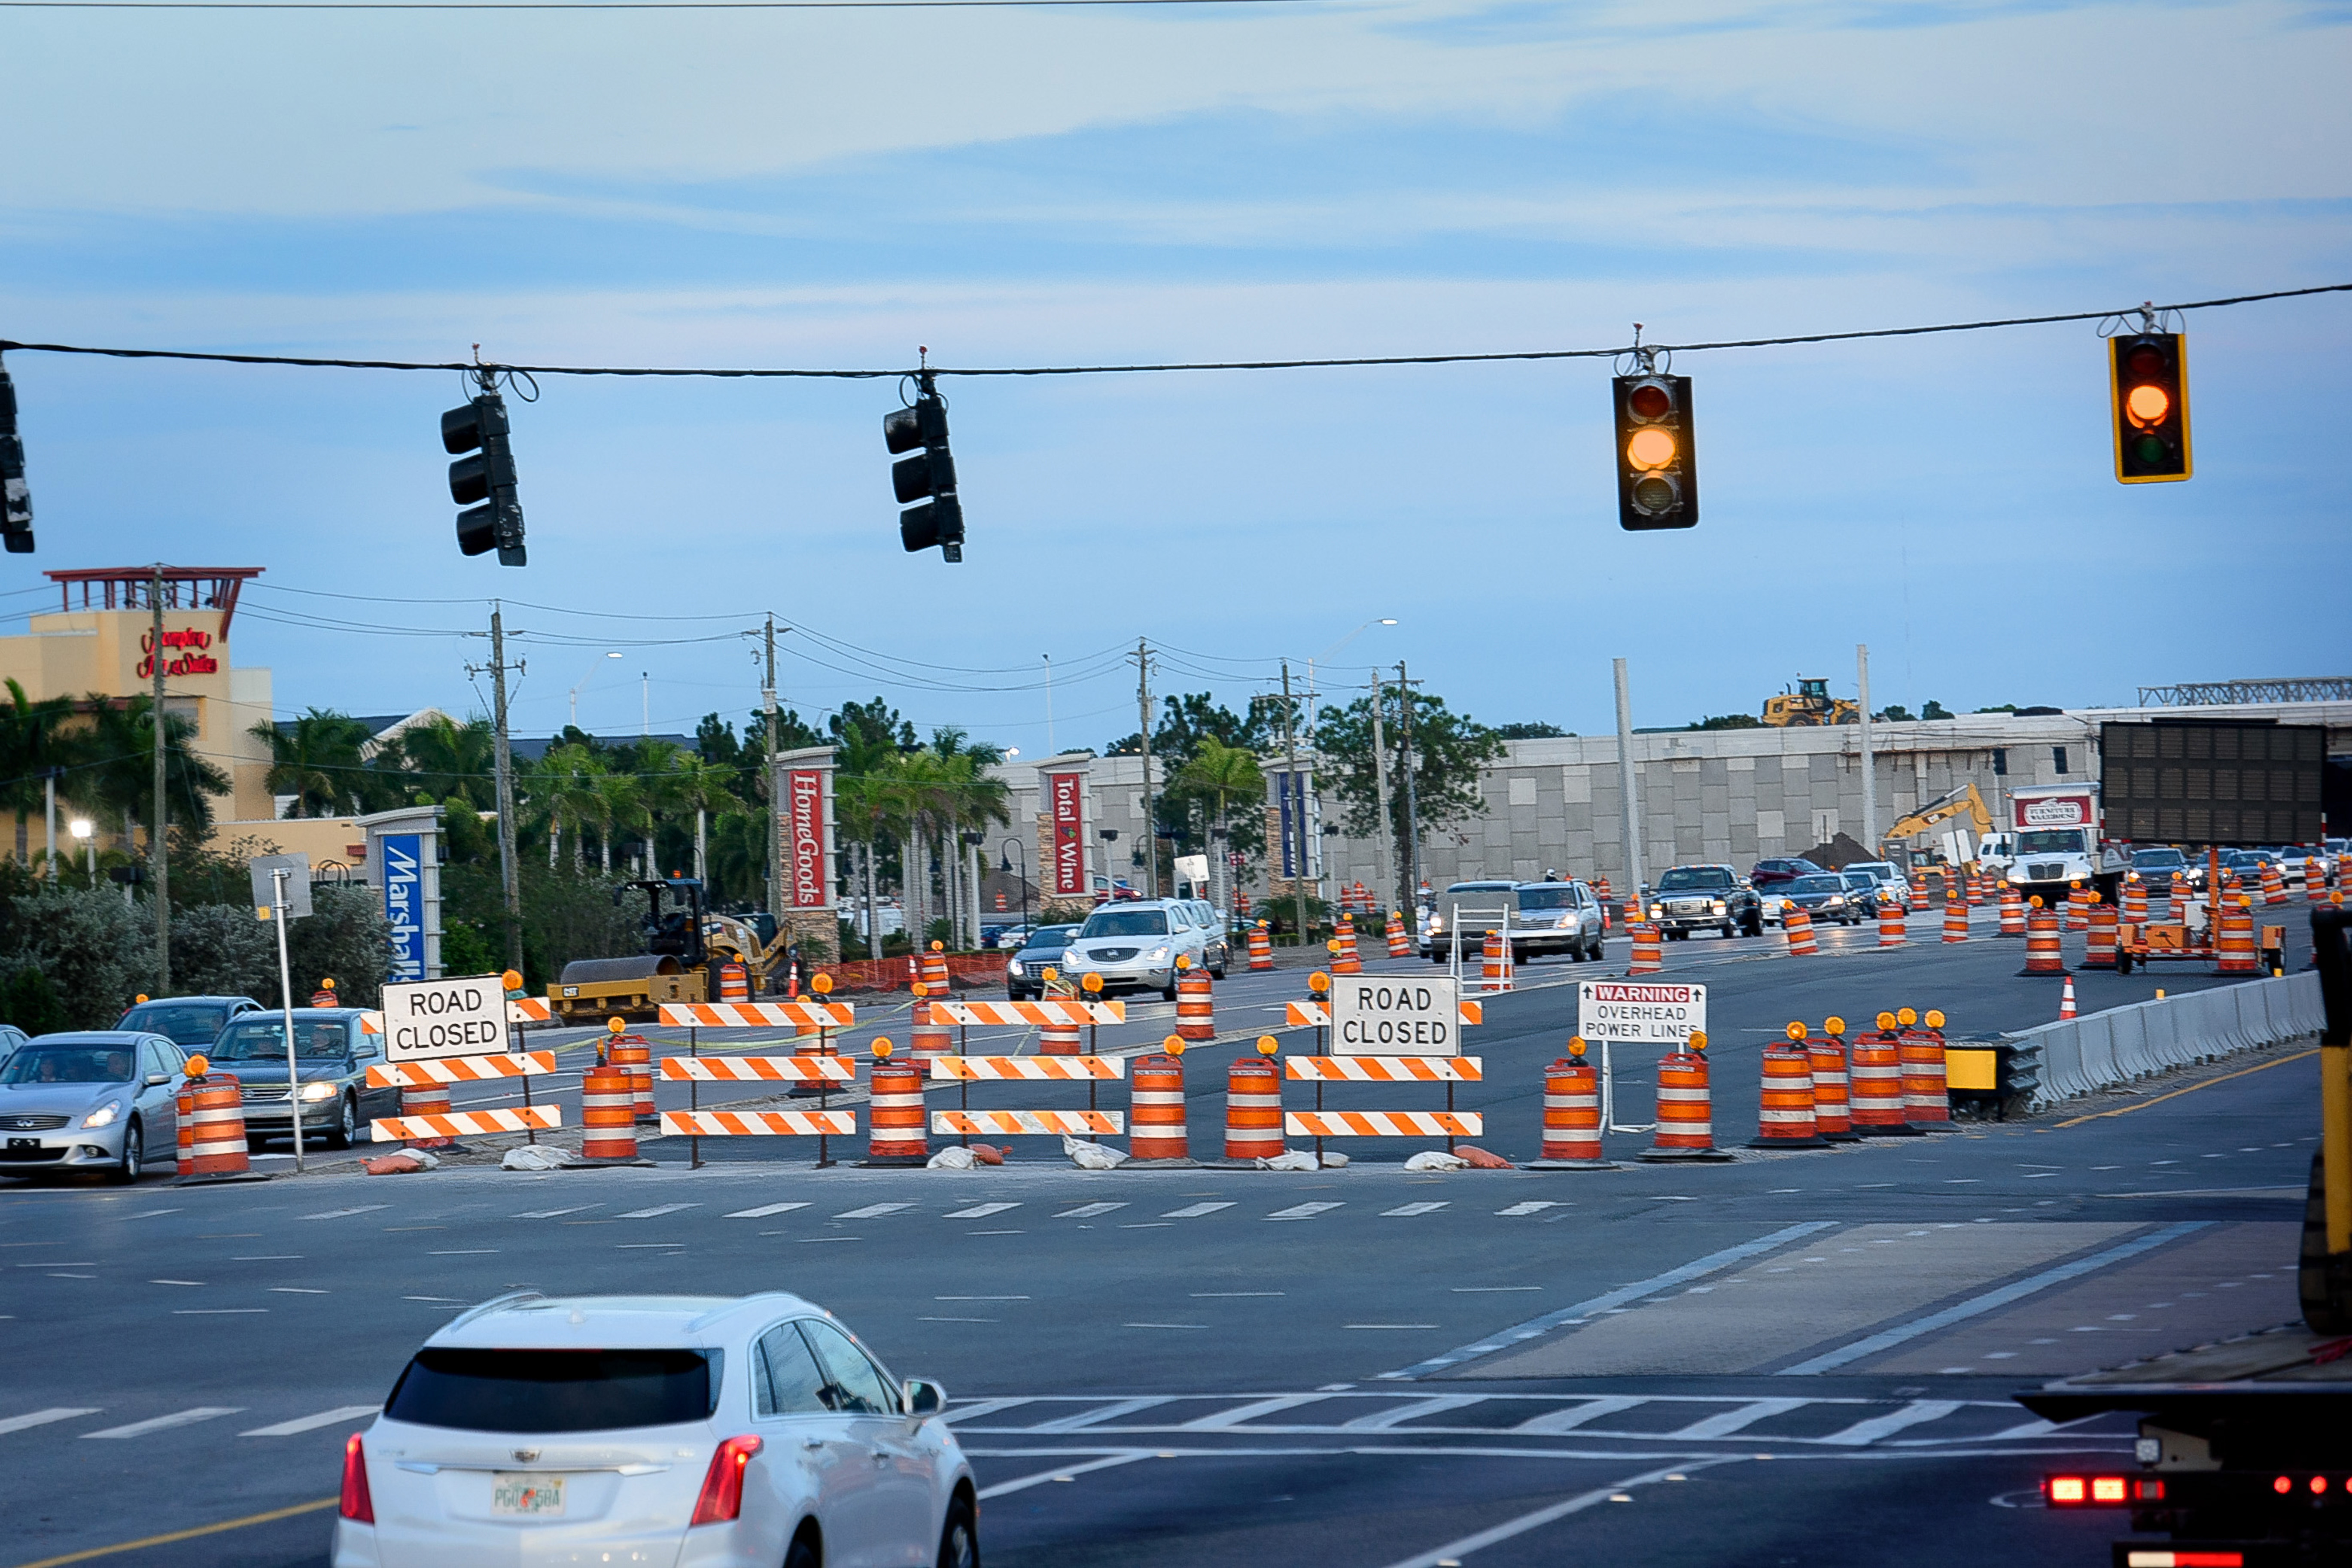 Traffic Light and Barricades